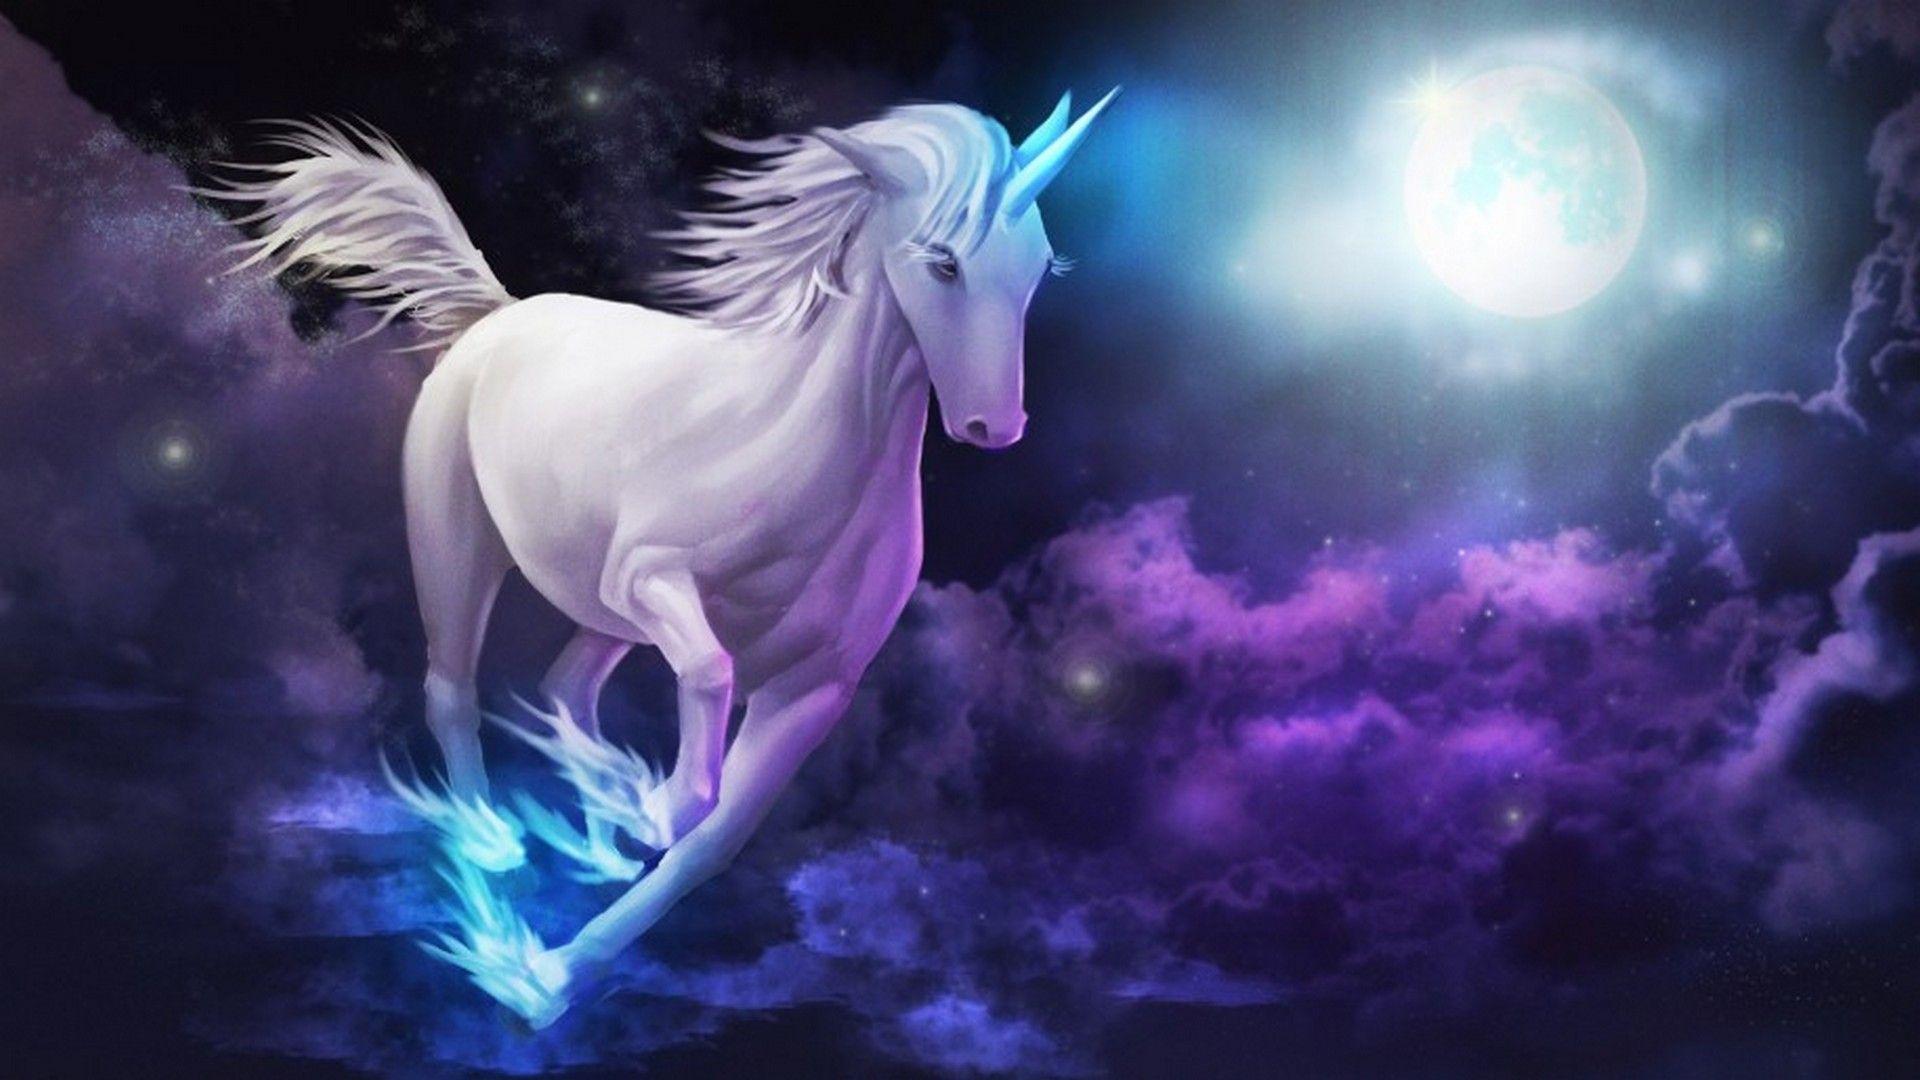 Unicorn Wallpaper For Desktop Best Wallpaper Hd In 2020 Unicorn Wallpaper Unicorn Backgrounds Cute Desktop Wallpaper